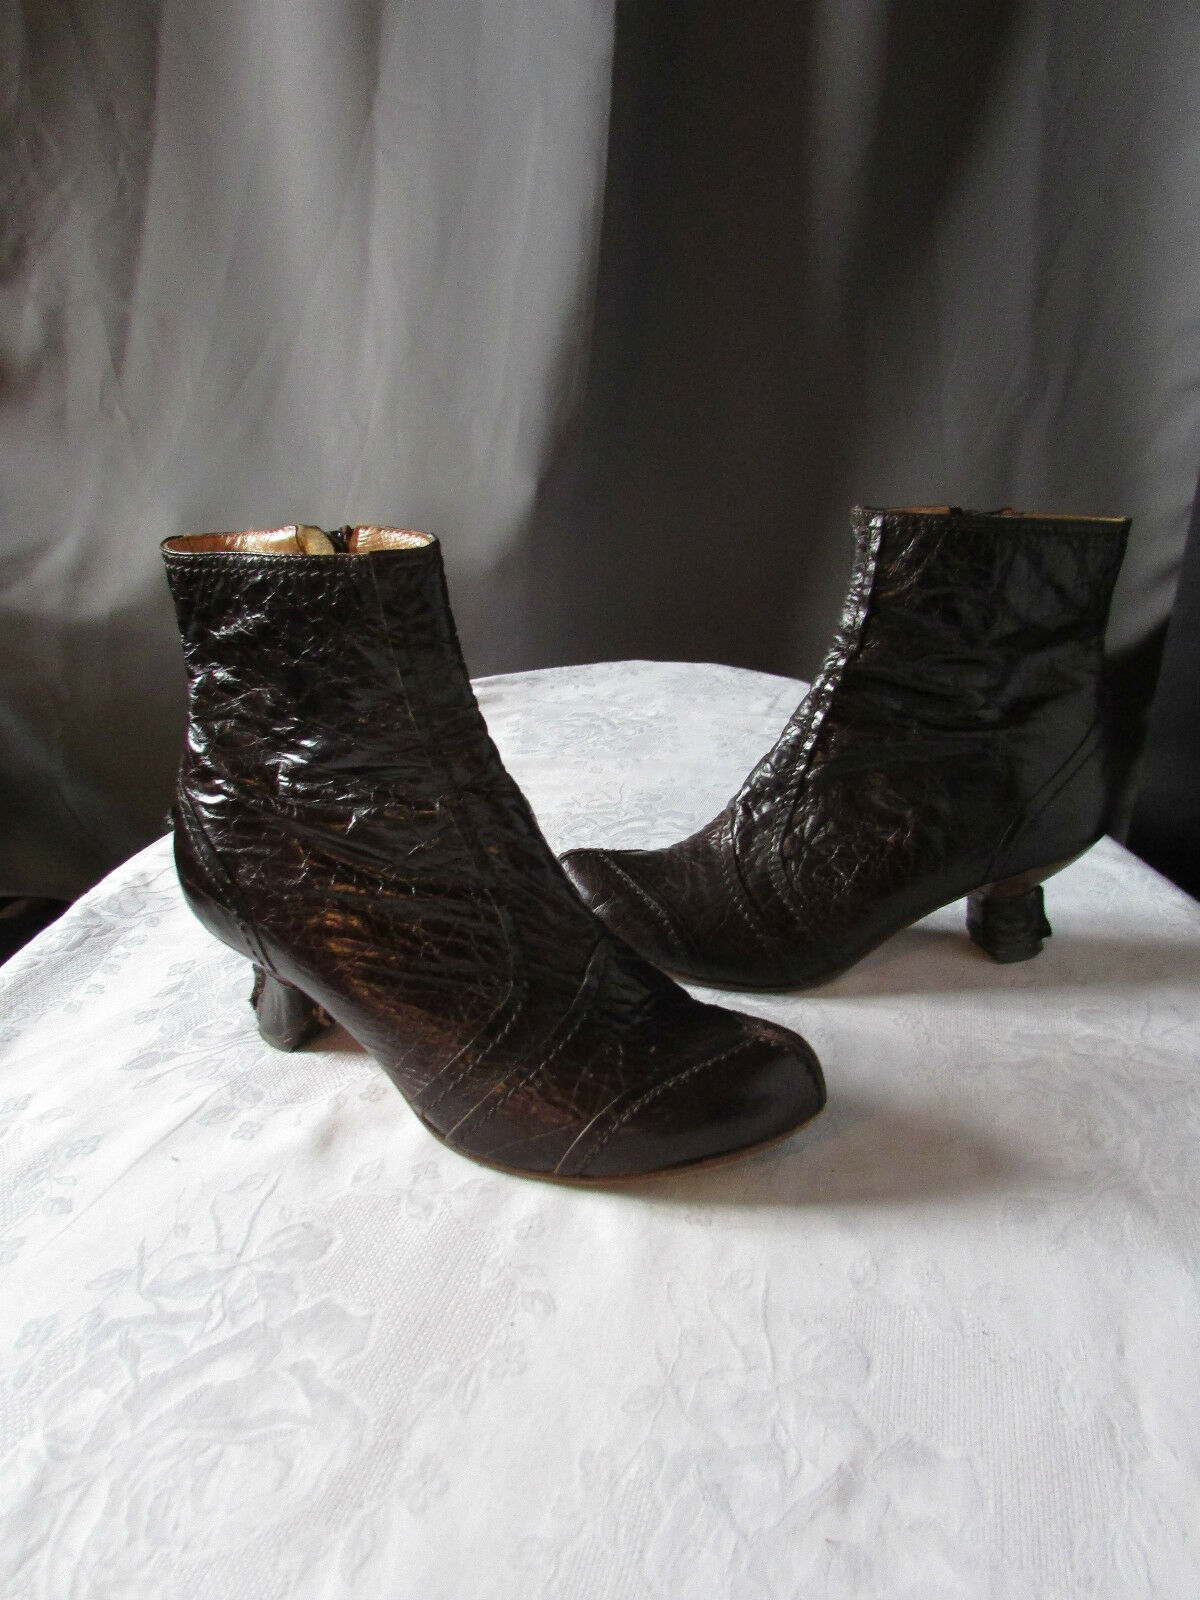 Stiefel/bottines harlot 37 cuir marron chocolat pointure 37 harlot 3a992f